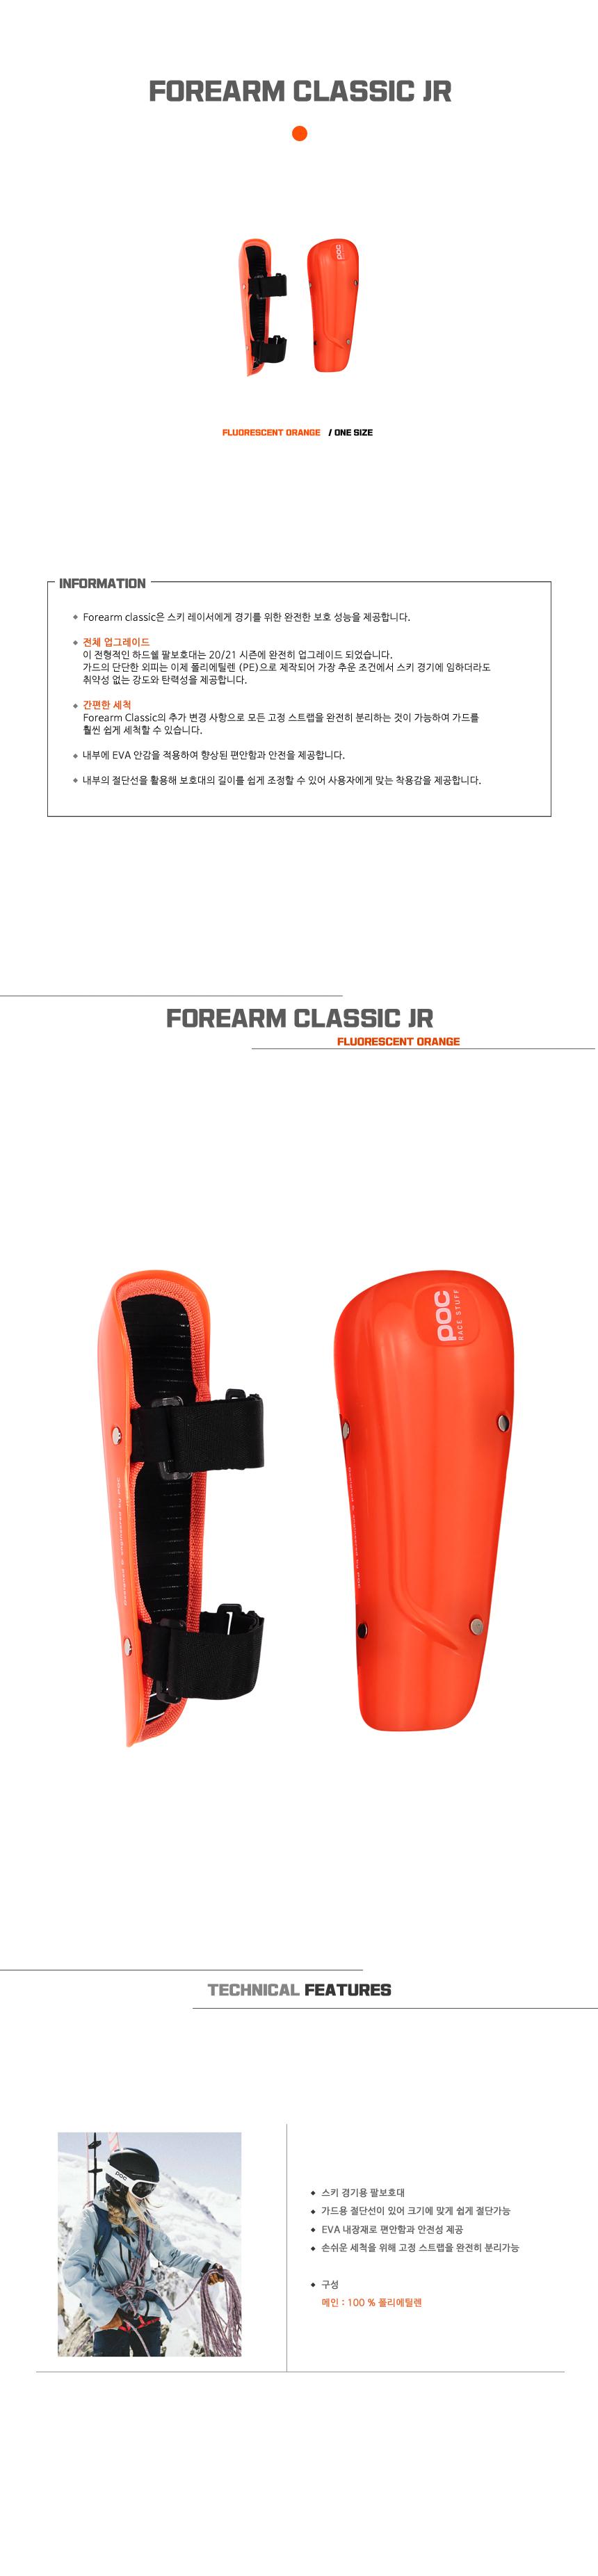 Forearm-Classic_jr_02.jpg